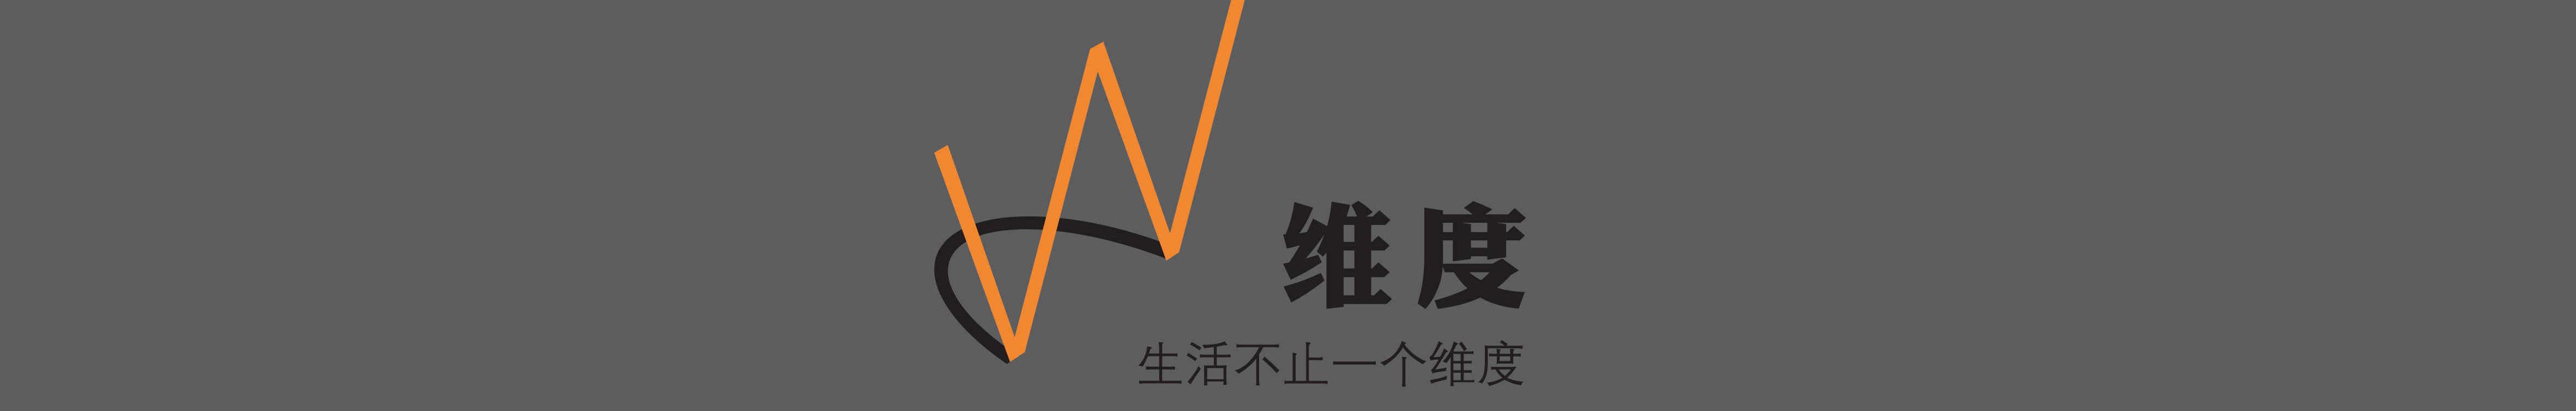 VidooVideo维度 banner